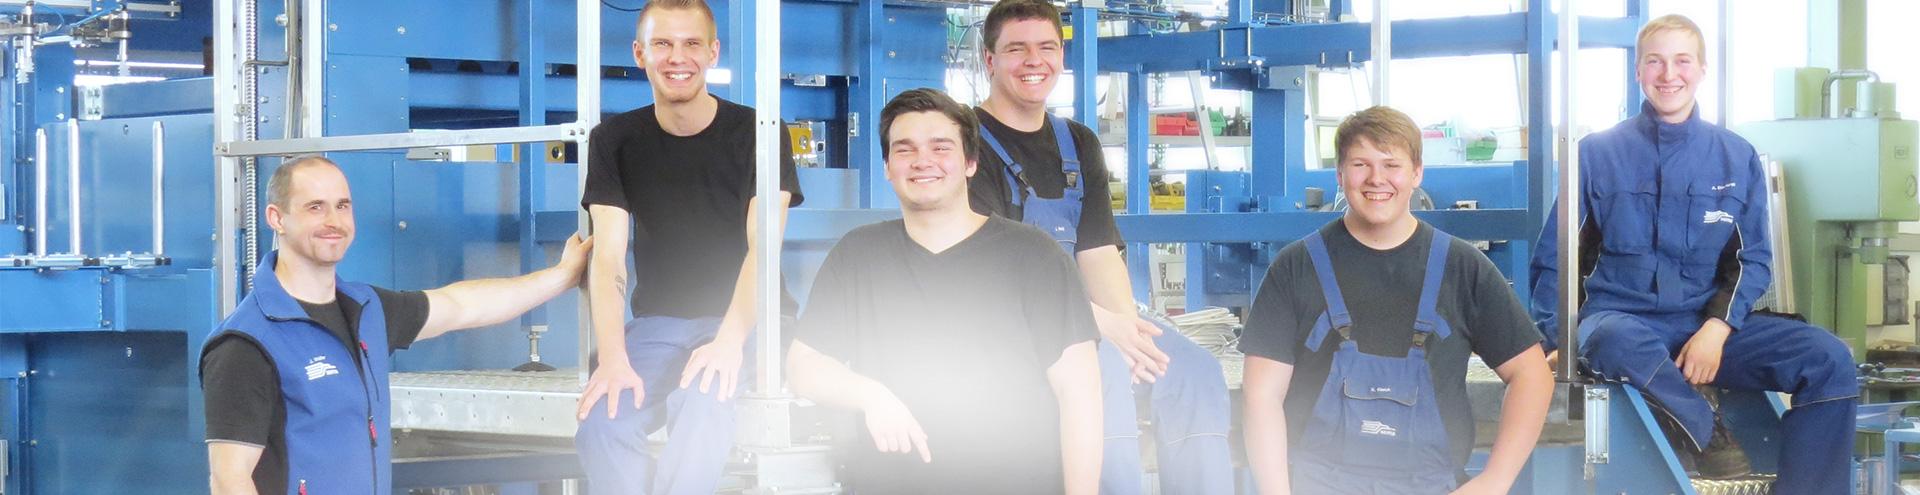 Ausbildung bei Sema Maschinenbau